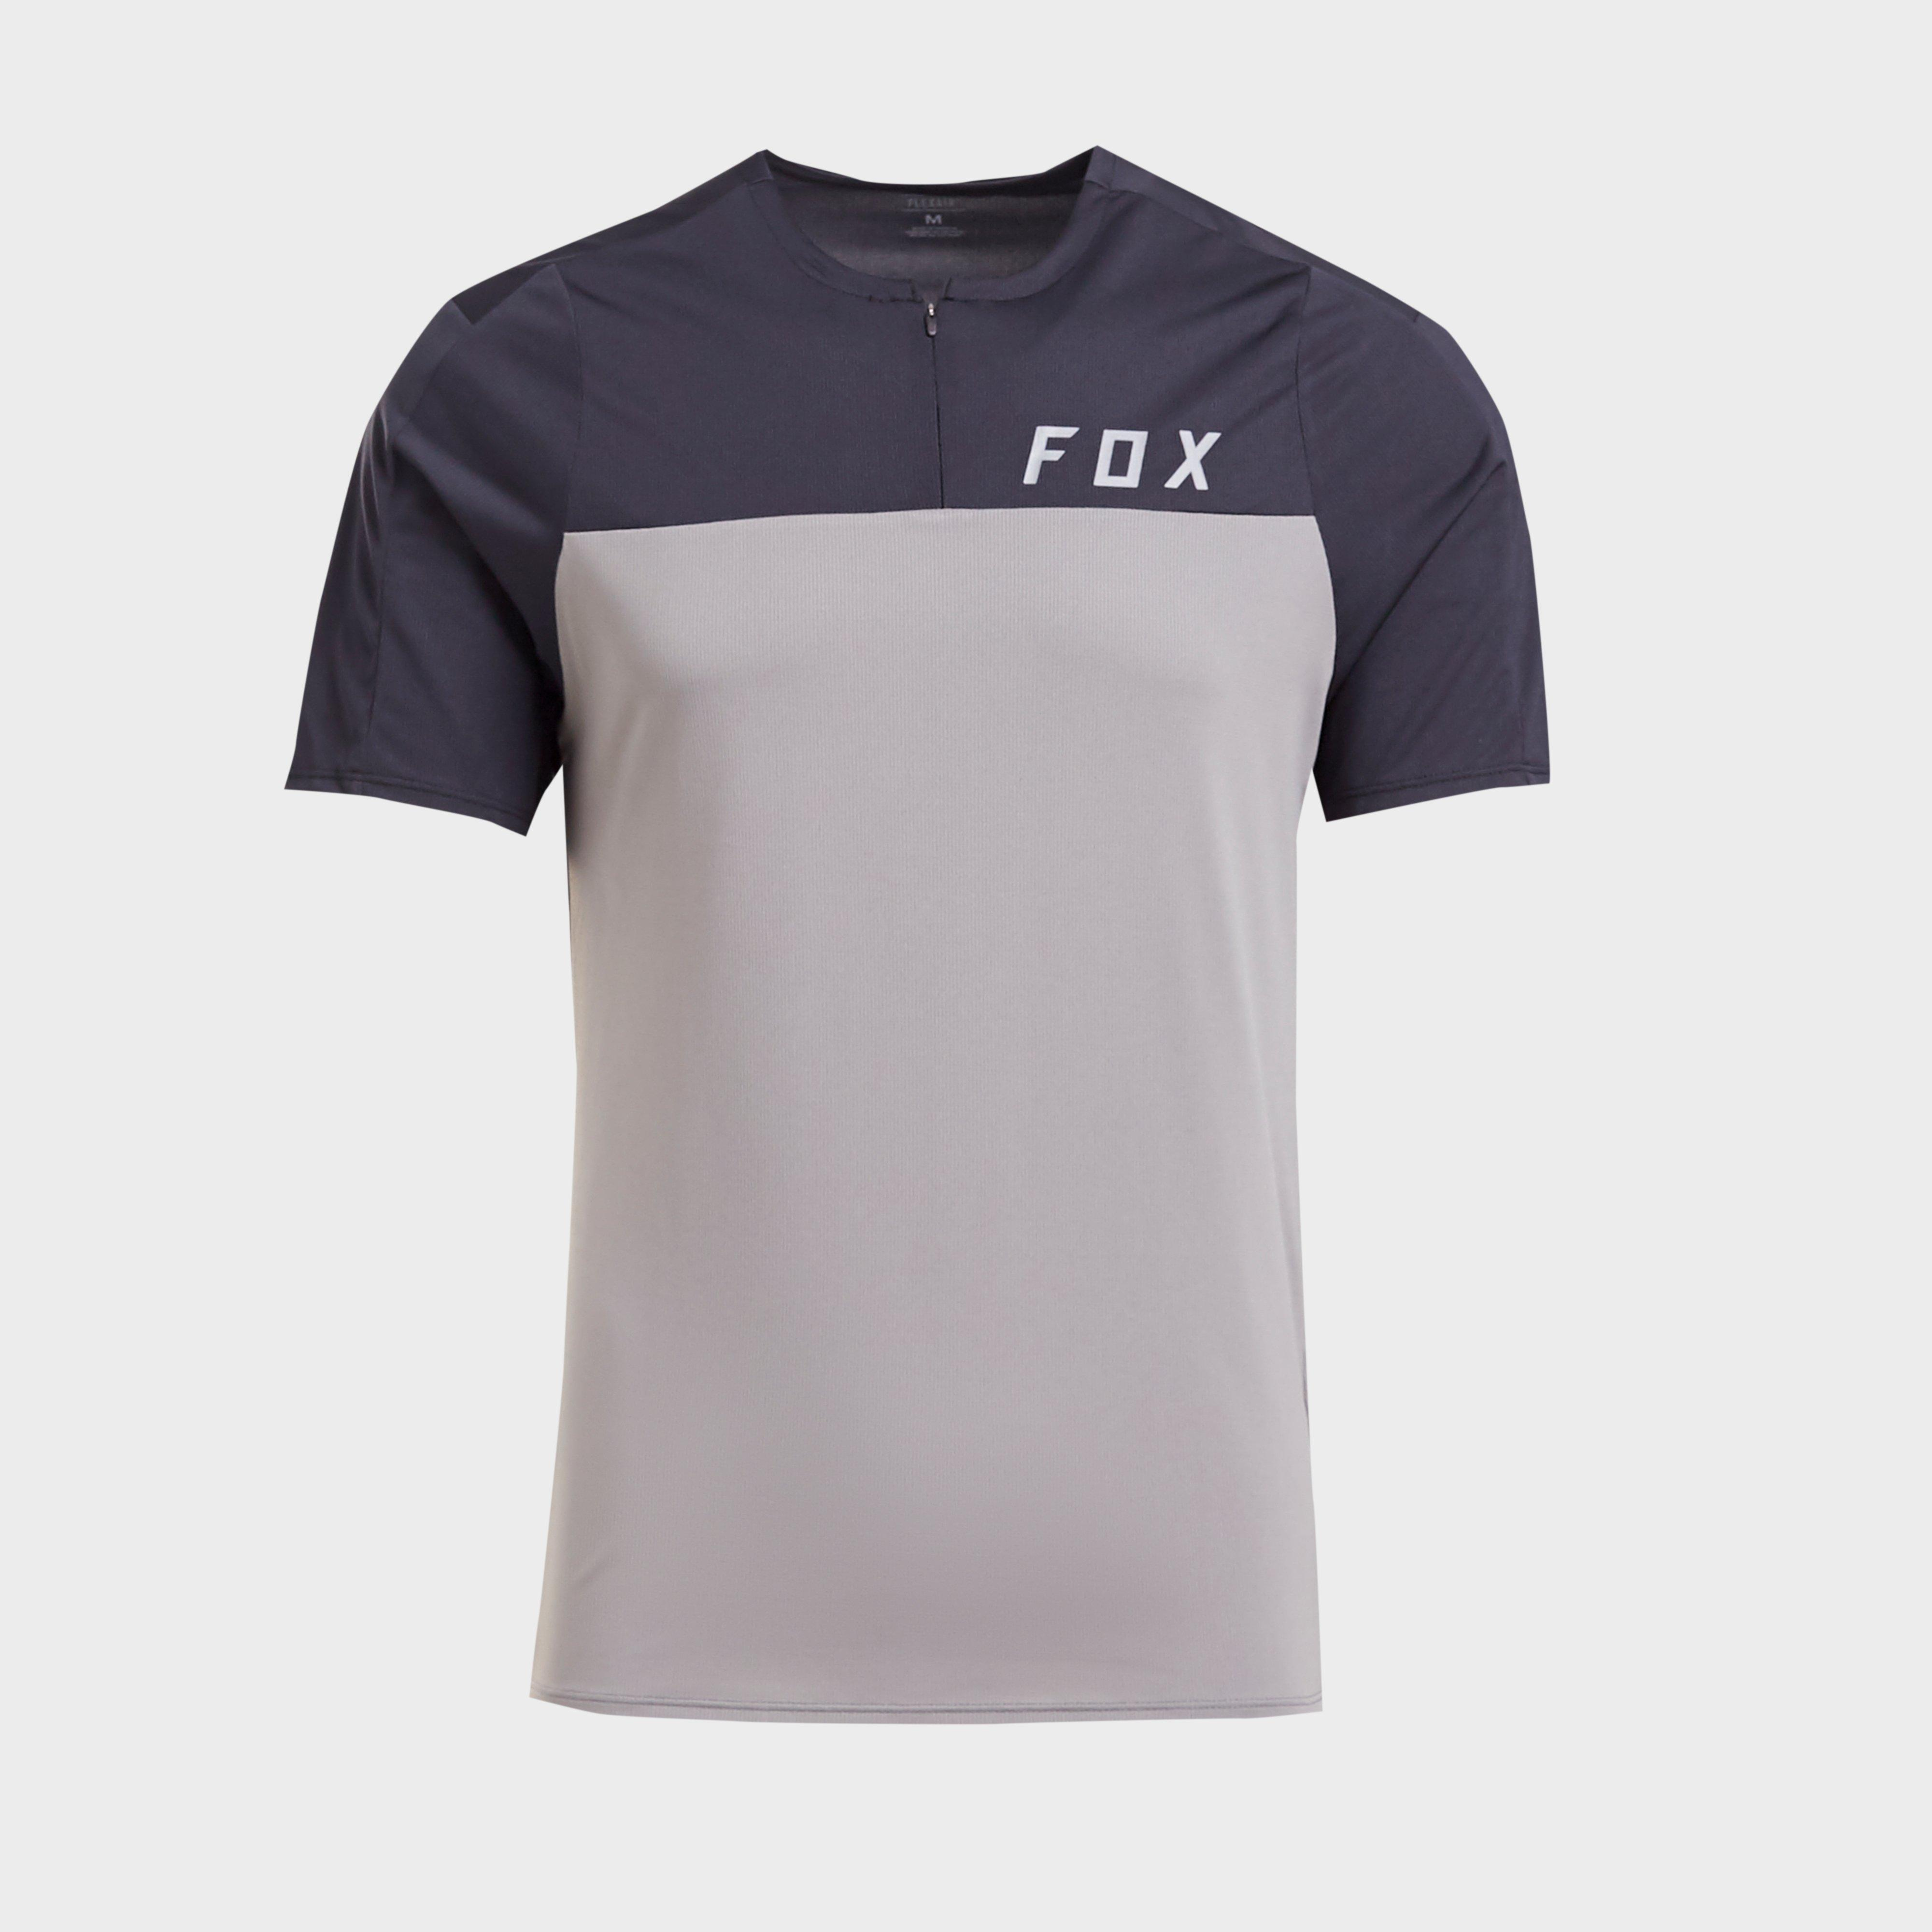 FOX Fox Mens Flexair Short Sleeve Jersey - Grey, Grey